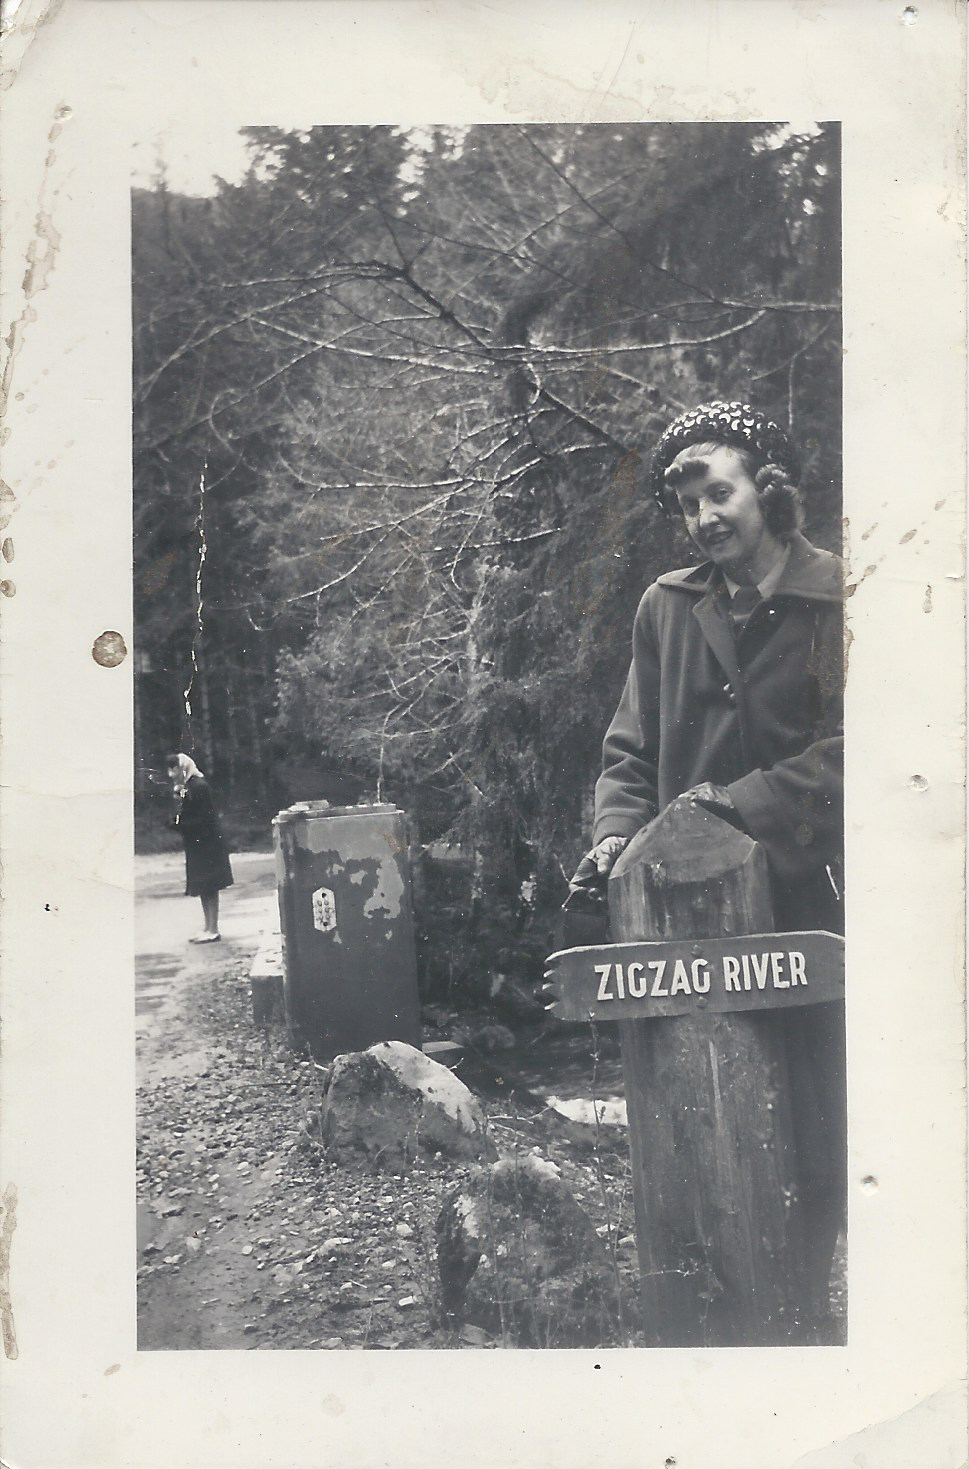 Zigzag River People